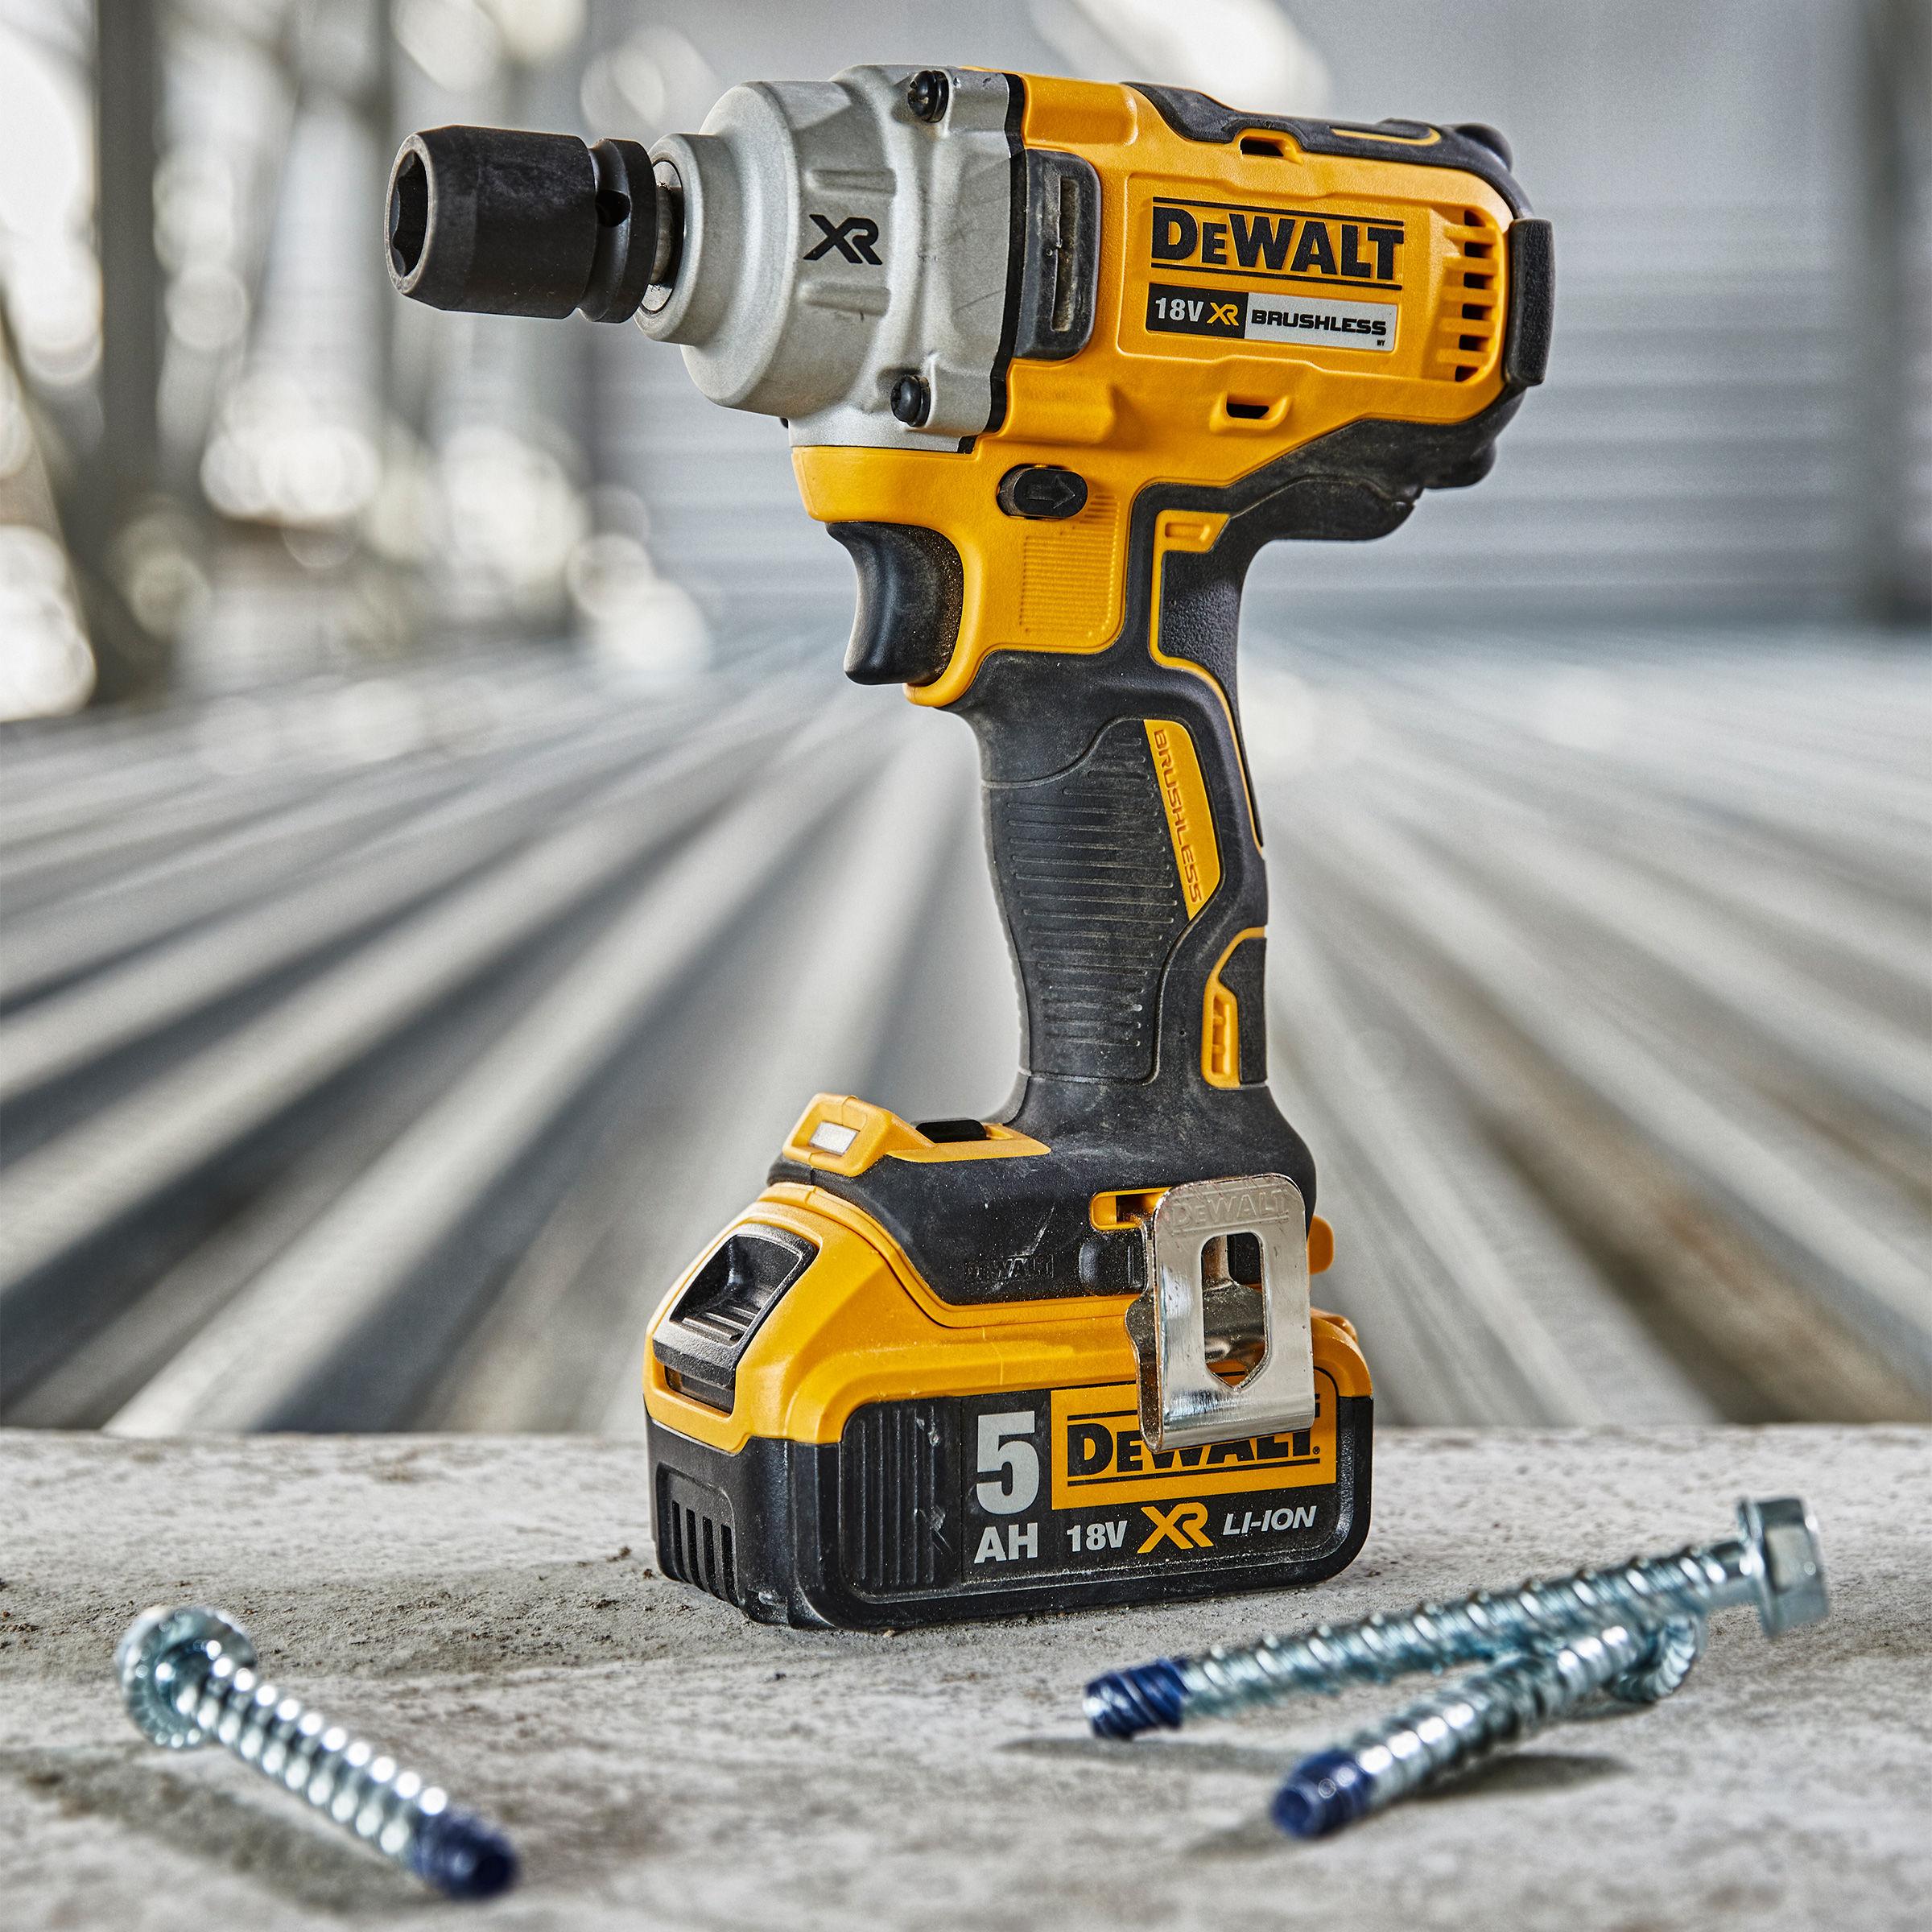 Dewalt Dcf894p2 Impact Wrench High Torque 18v Xr Cordless Brushless 2 X 5 0ah Batteries